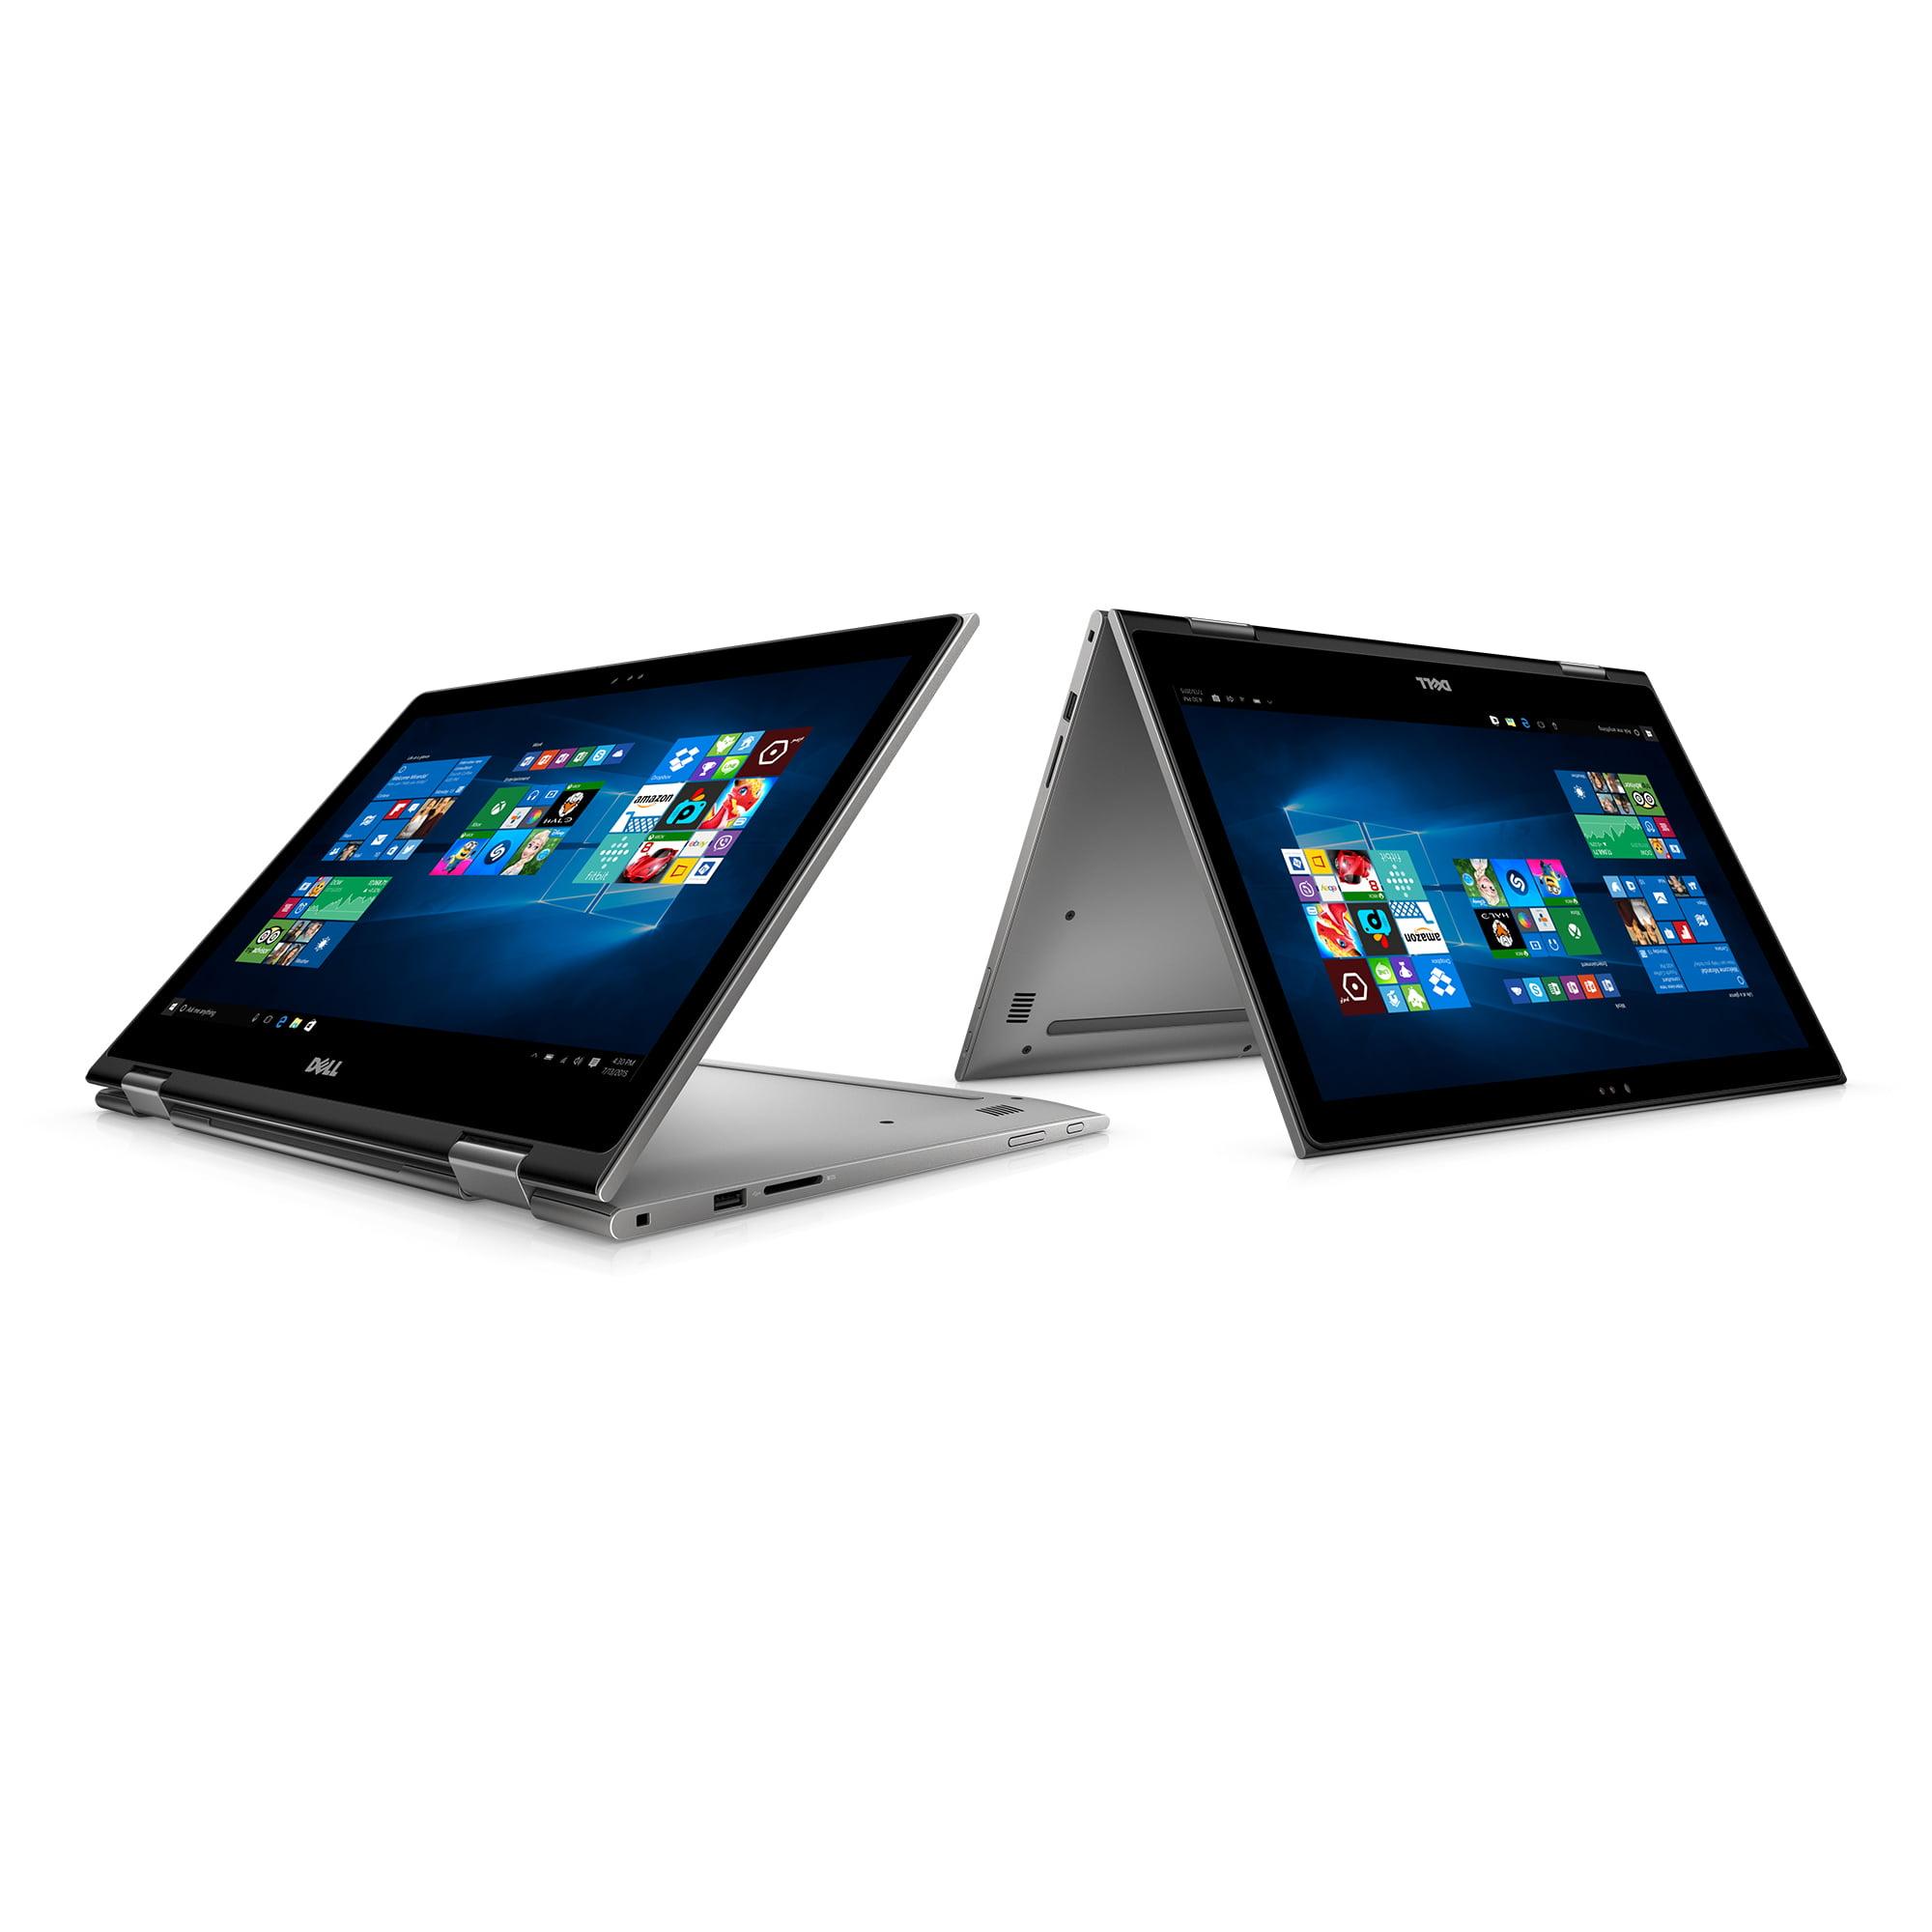 Dell Inspiron 15 5000 Series 2-in-1 Laptop - Intel Core i5-7200U - 8GB RAM -1TB Hard Drive